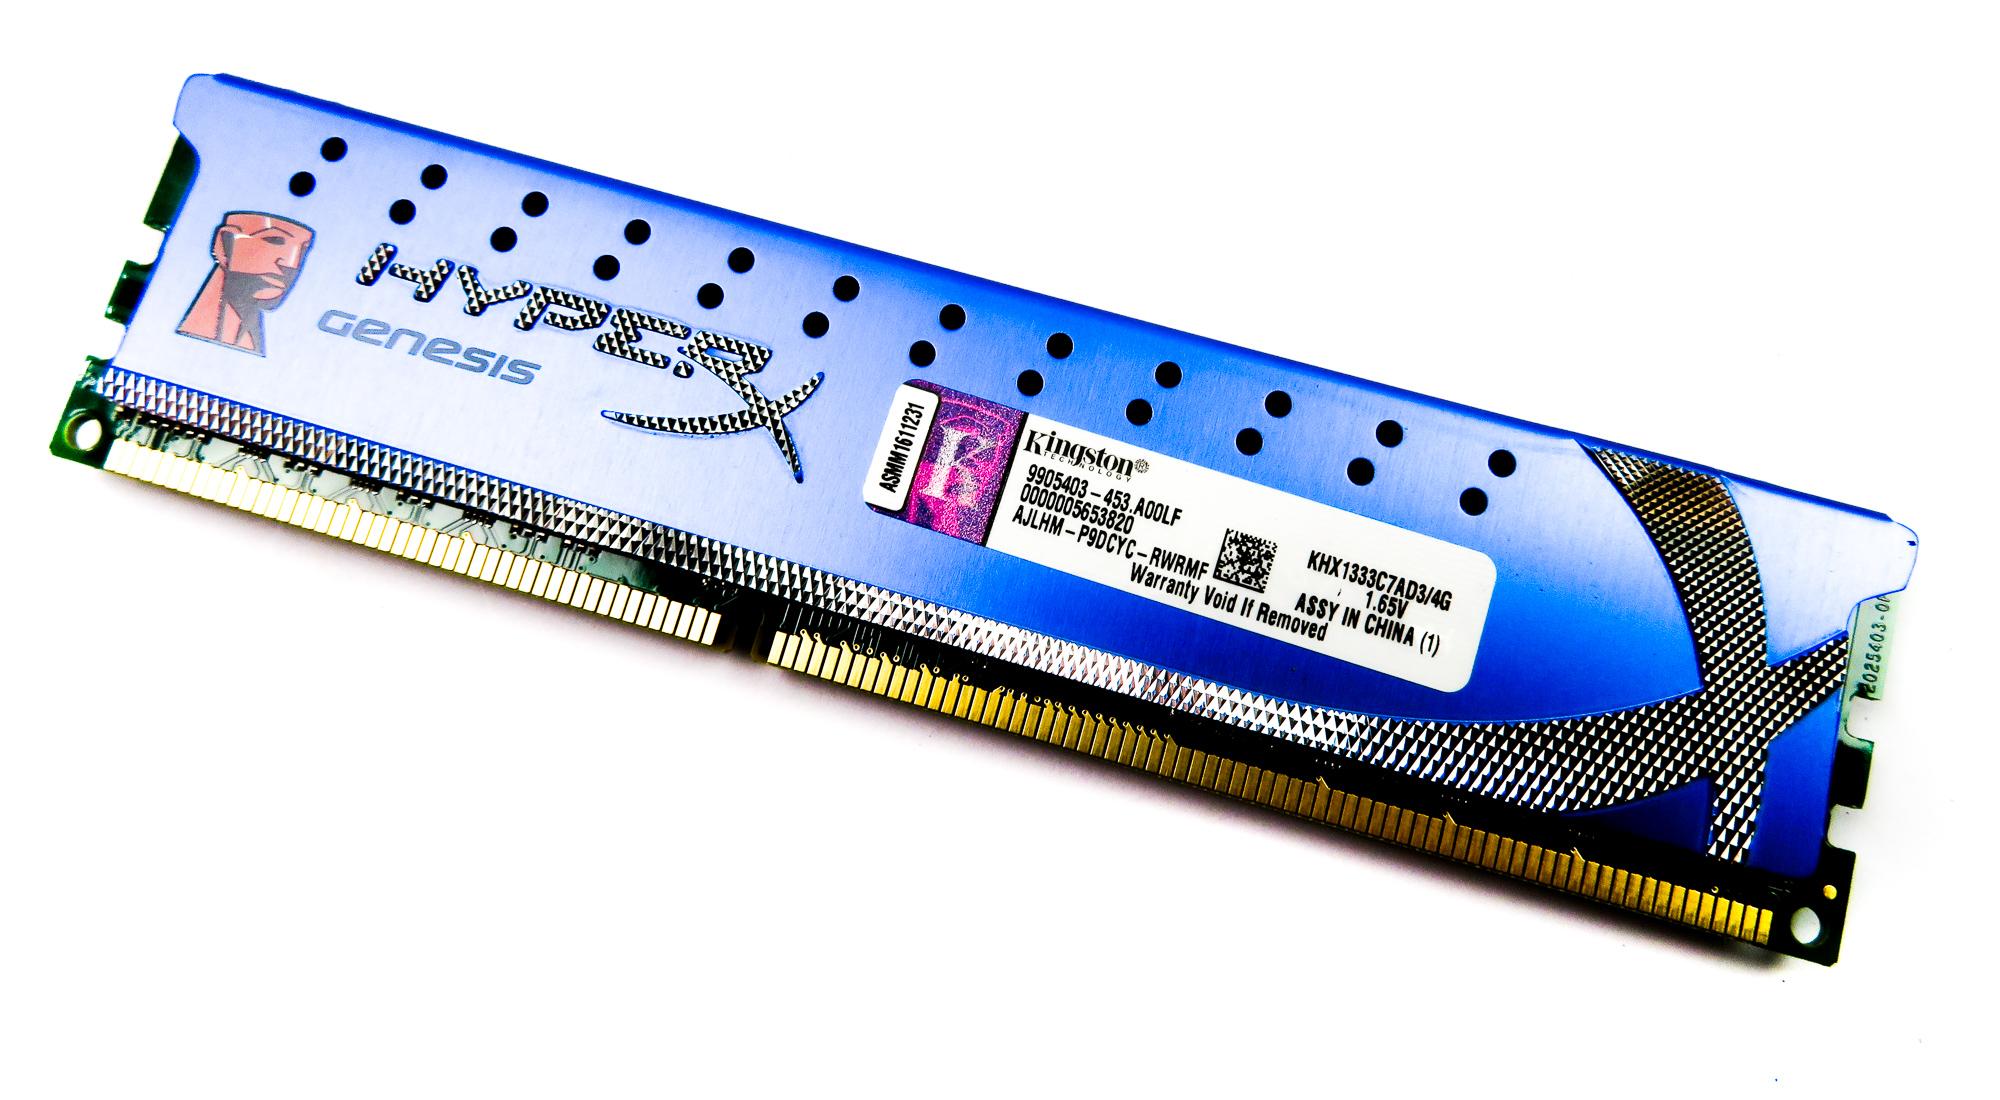 Kingston KHX1333C7AD3/4G HyperX Genesis 4GB (1X4GB) 10600 DDR3 PC3 DIMM RAM